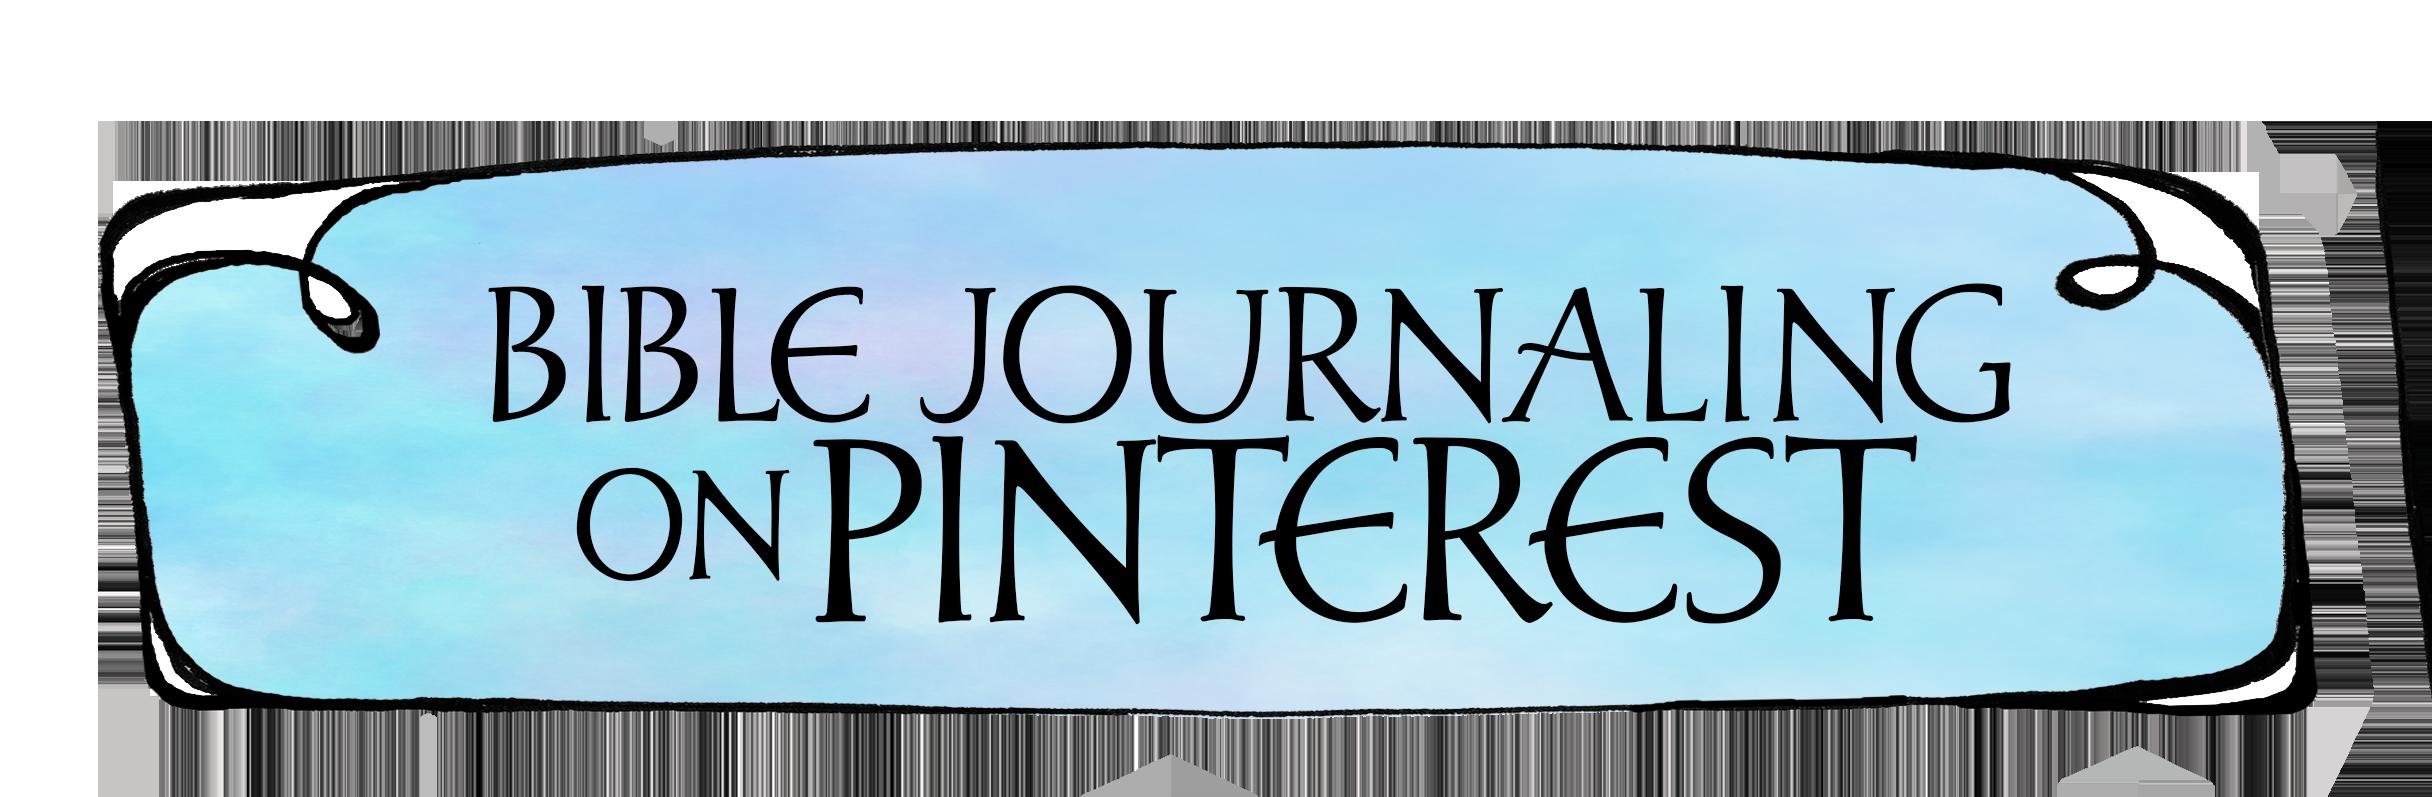 Bible Journaling Pinterest